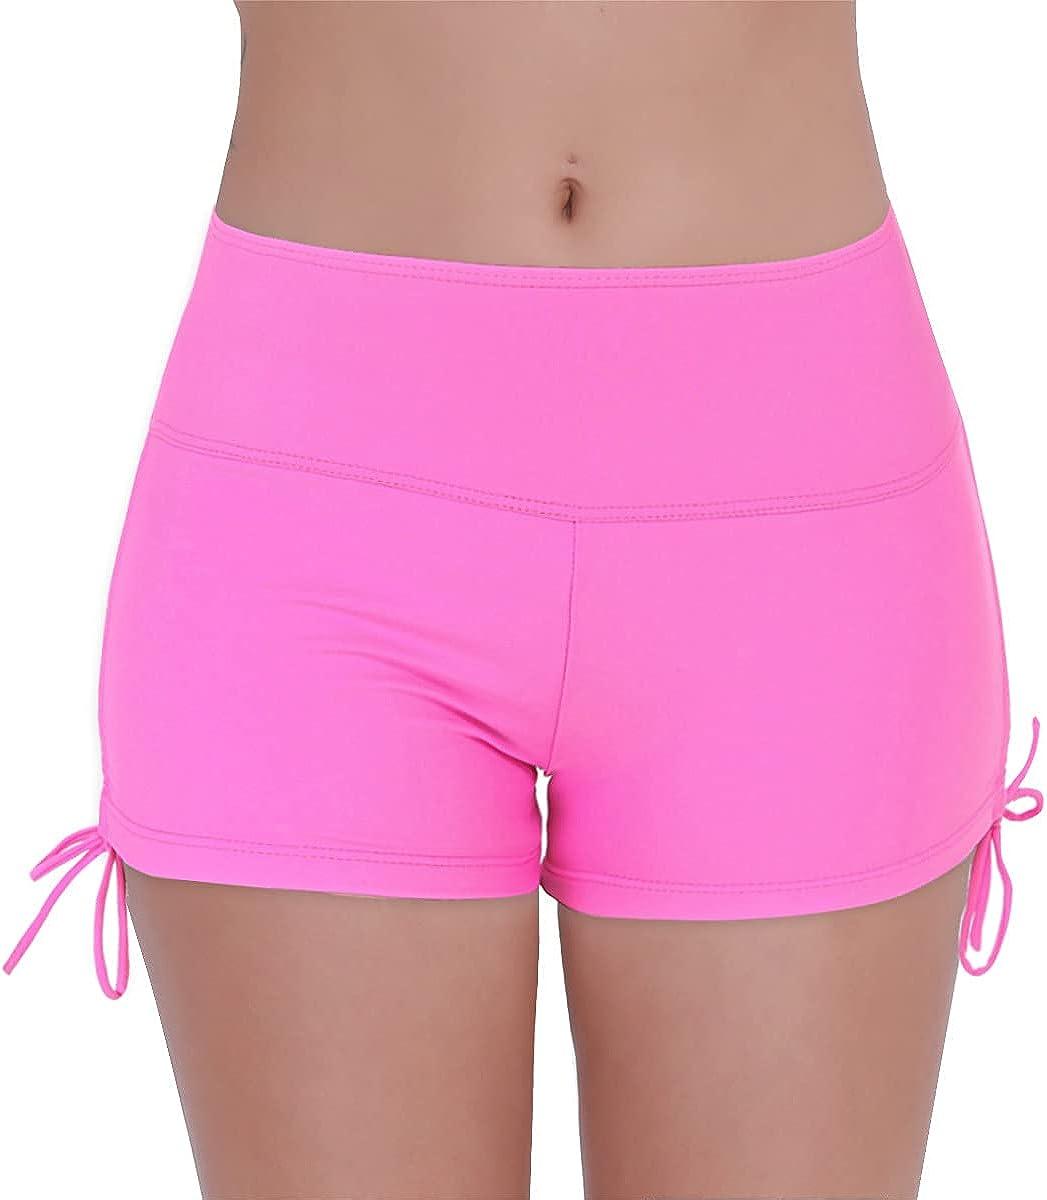 TSSOE Women's Drawstring Side Boy Shorts Swim Bottoms Full Coverage Bikini Tankini Boyleg Swimsuit